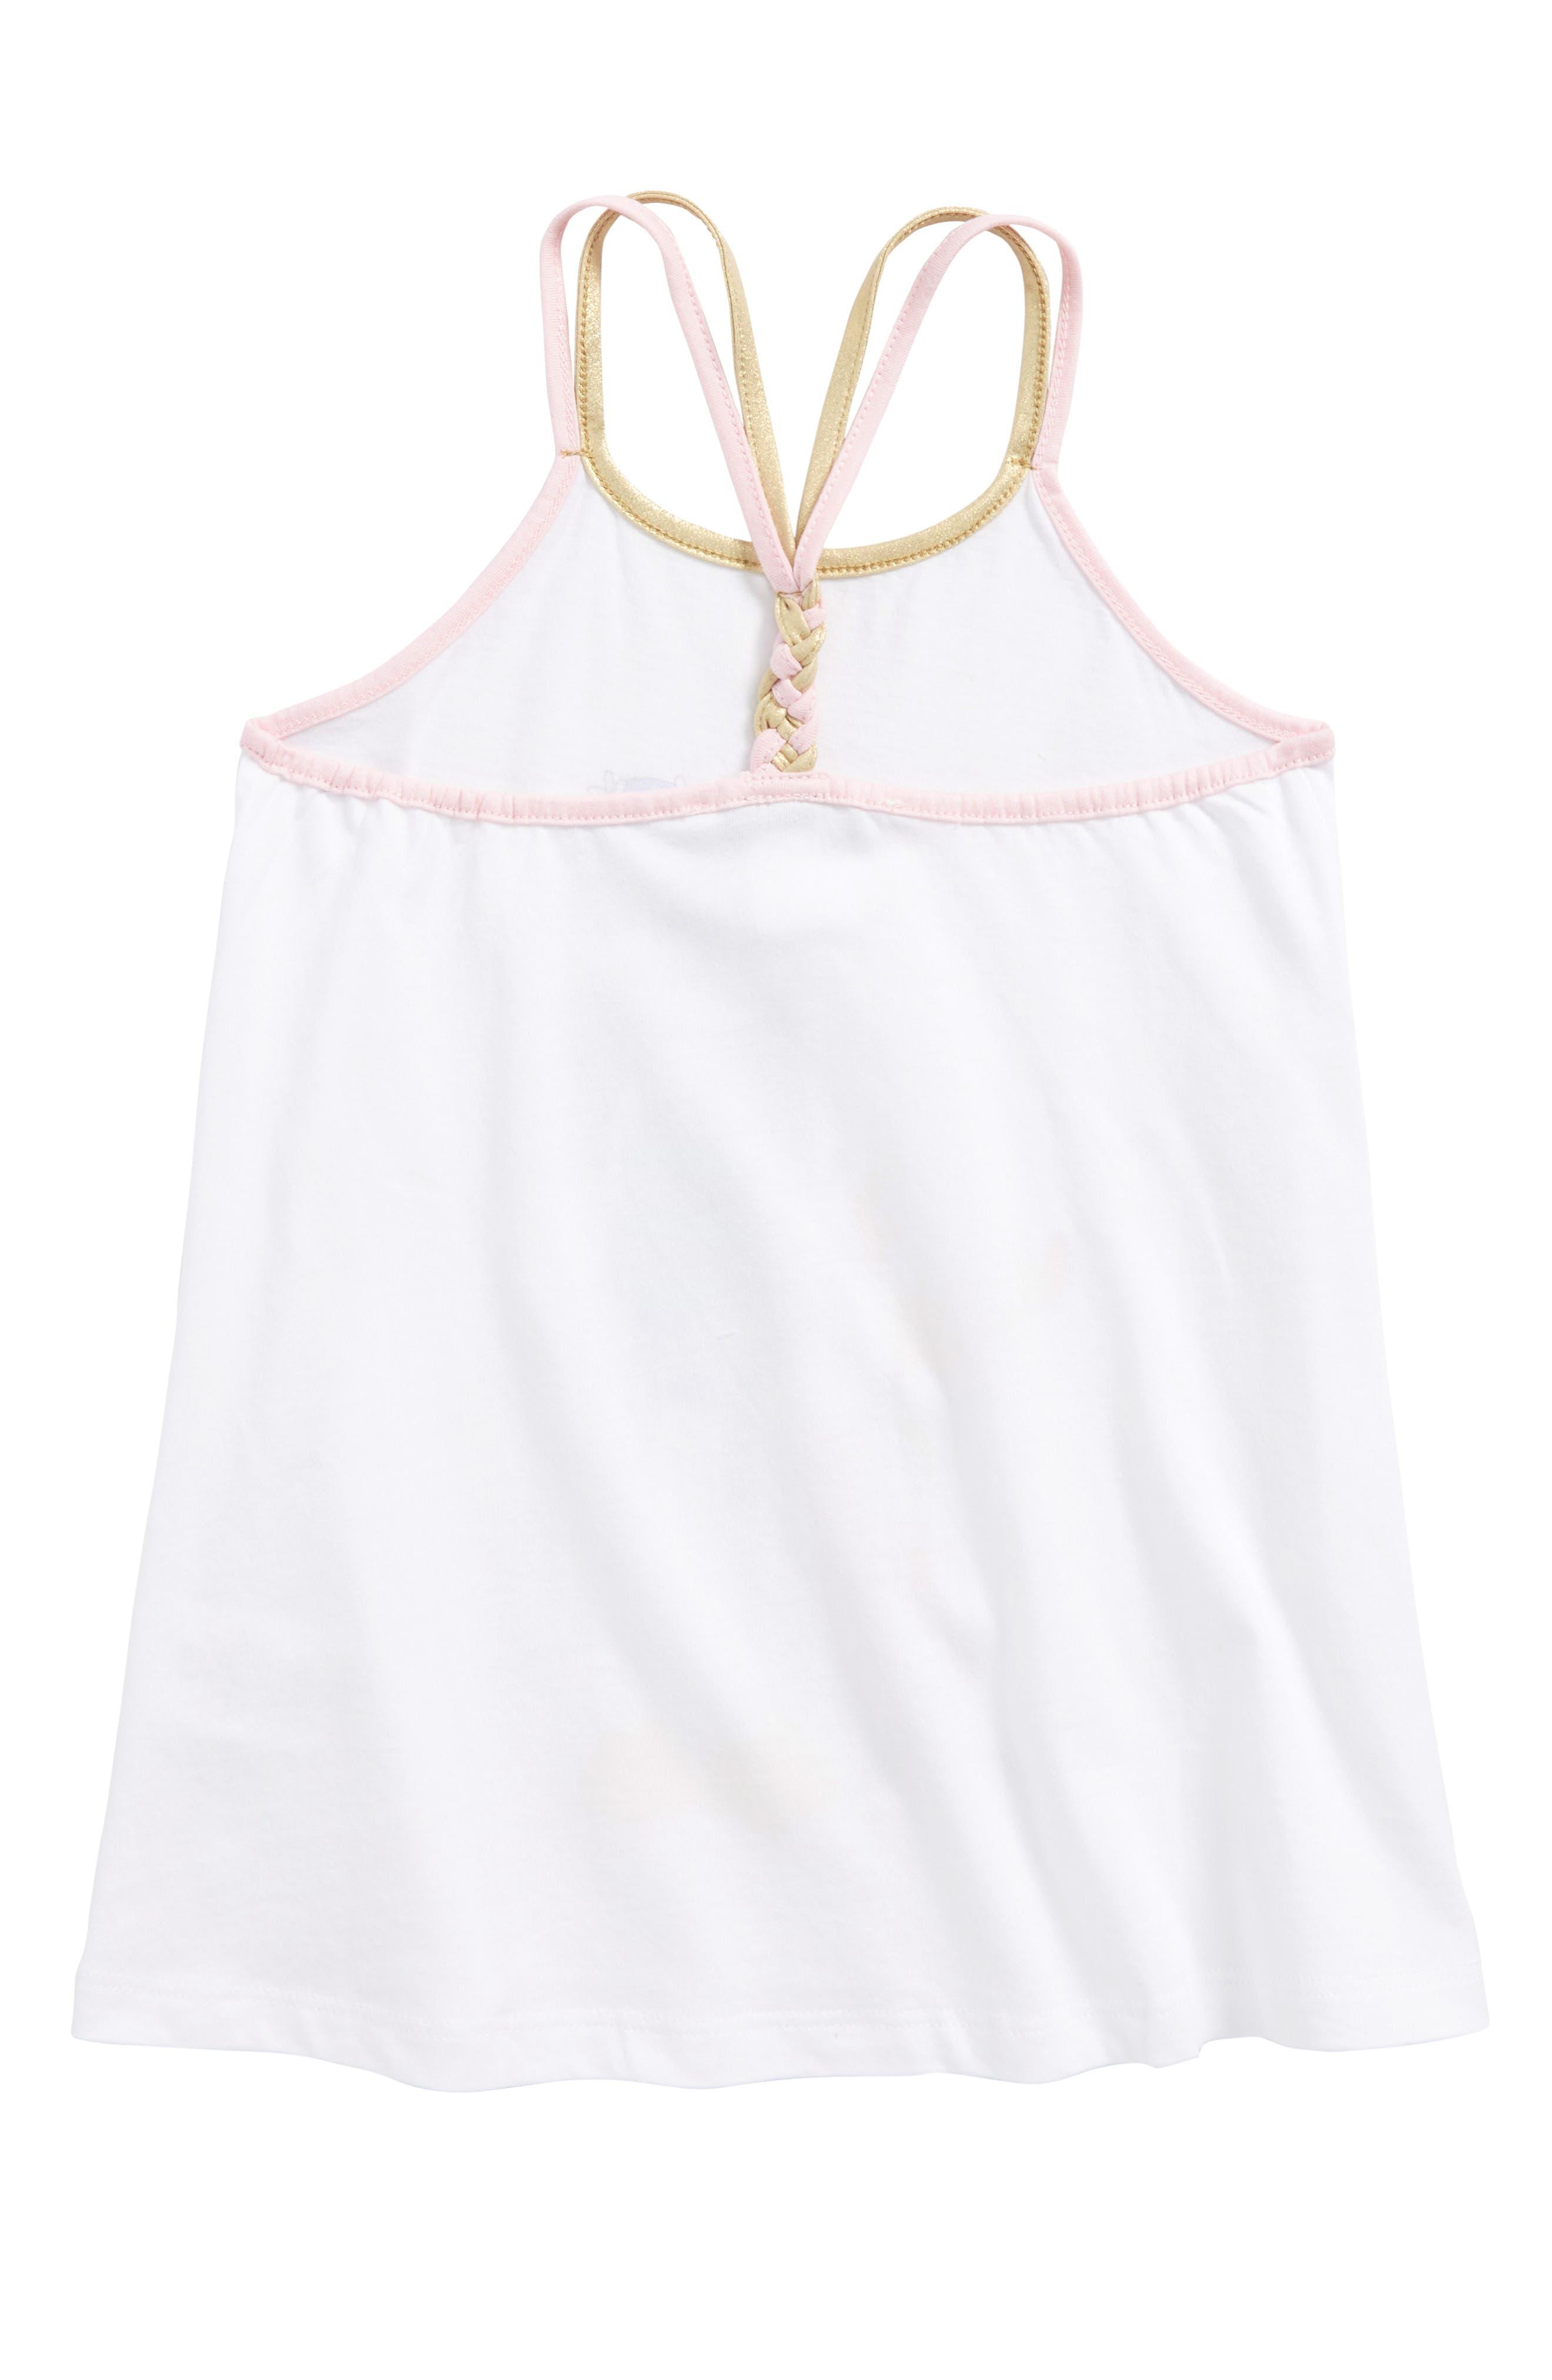 Miss Marc Beach Tank Dress,                             Alternate thumbnail 2, color,                             Blanc